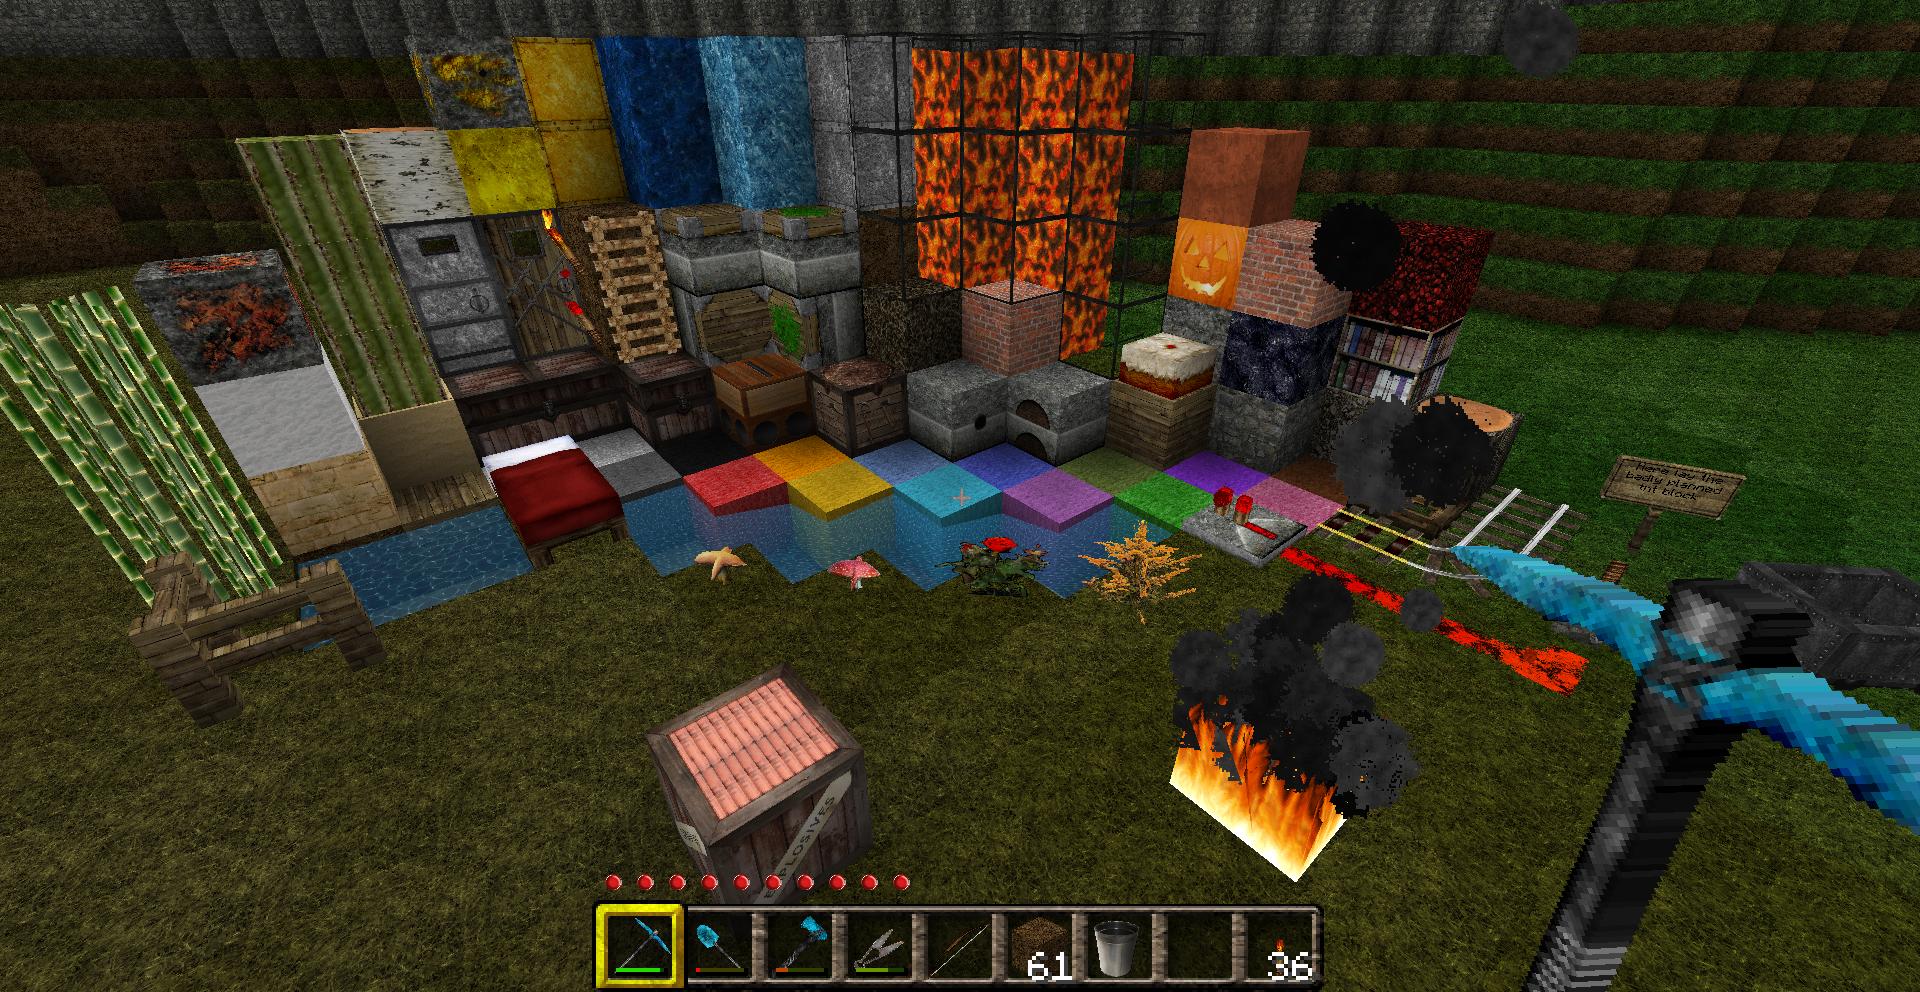 minecraft текстуры lb photo realism: